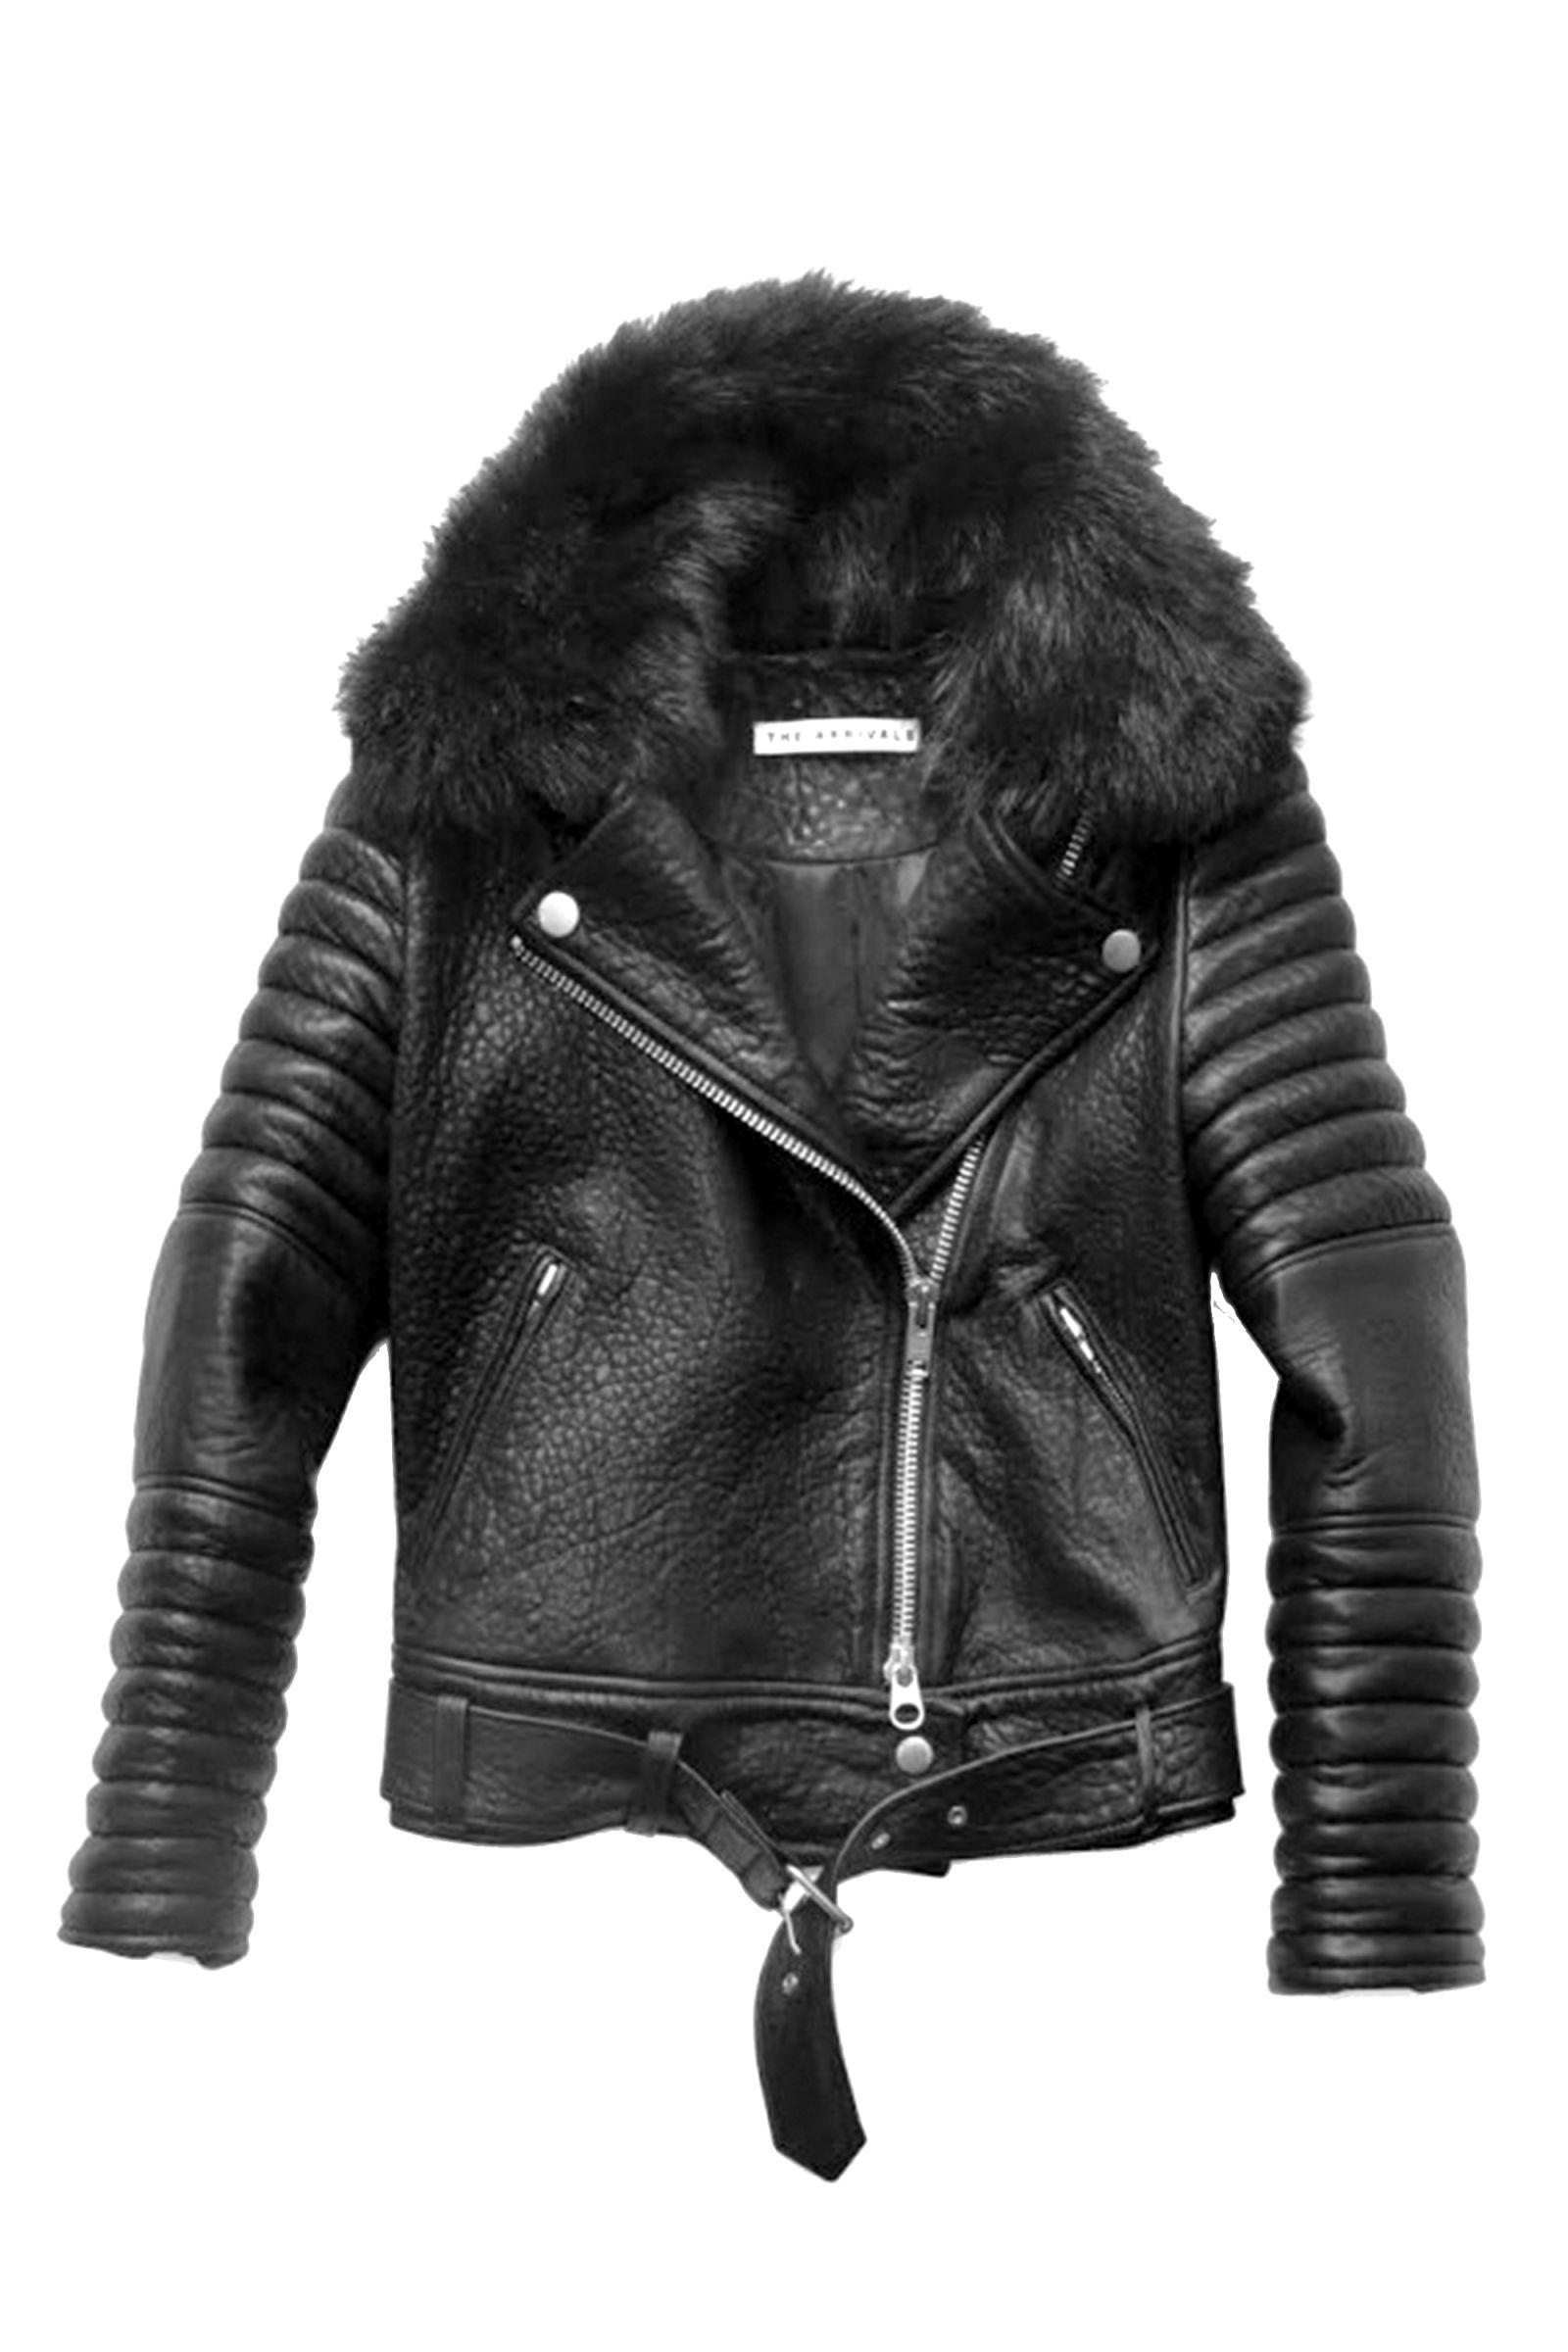 The Arrivals Rainier Jacket, $685; thearrivals.com